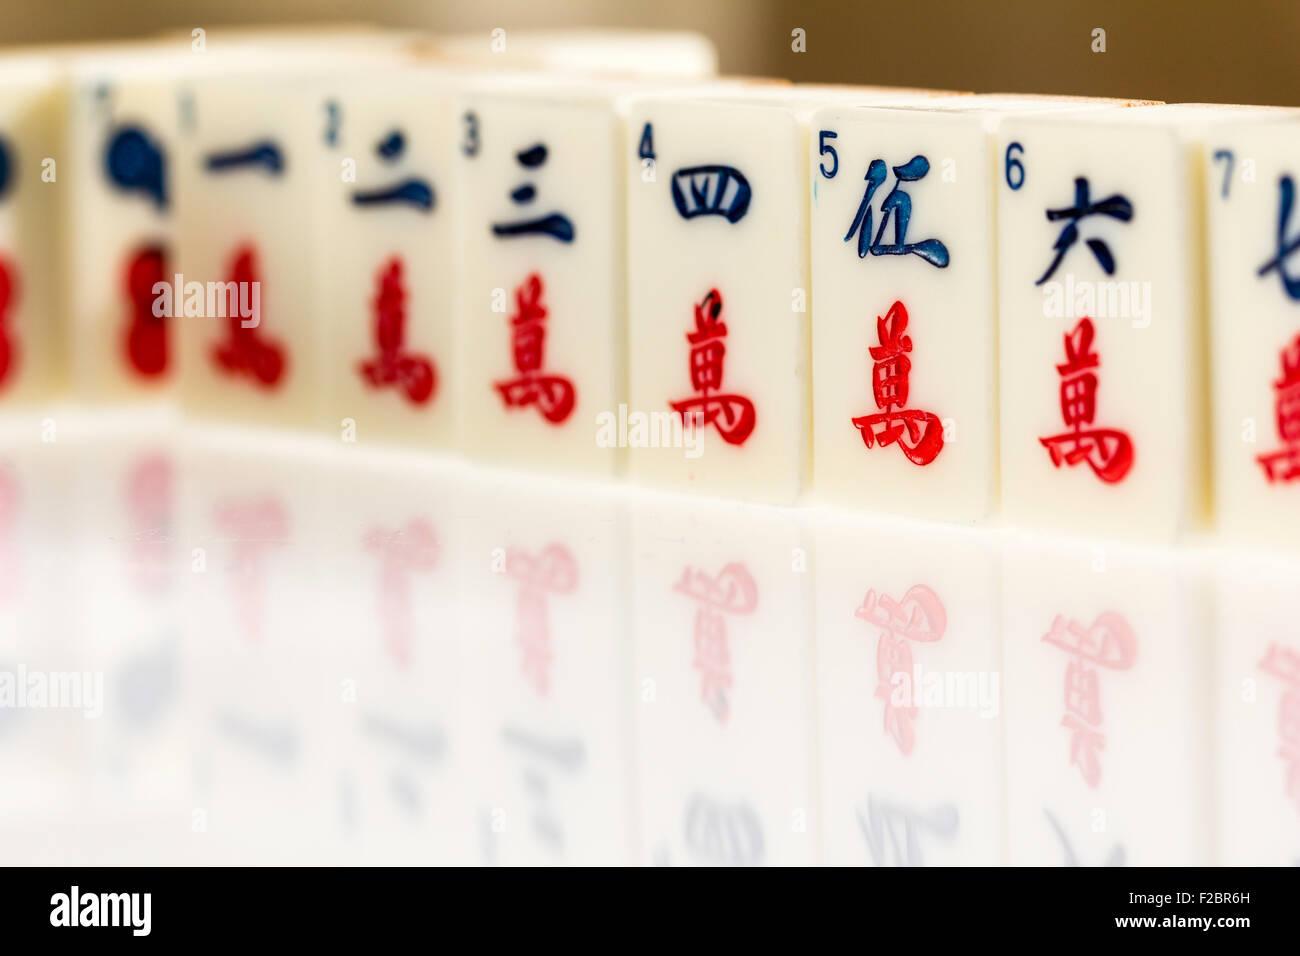 Mahjong Tiles Stock Photos & Mahjong Tiles Stock Images - Alamy